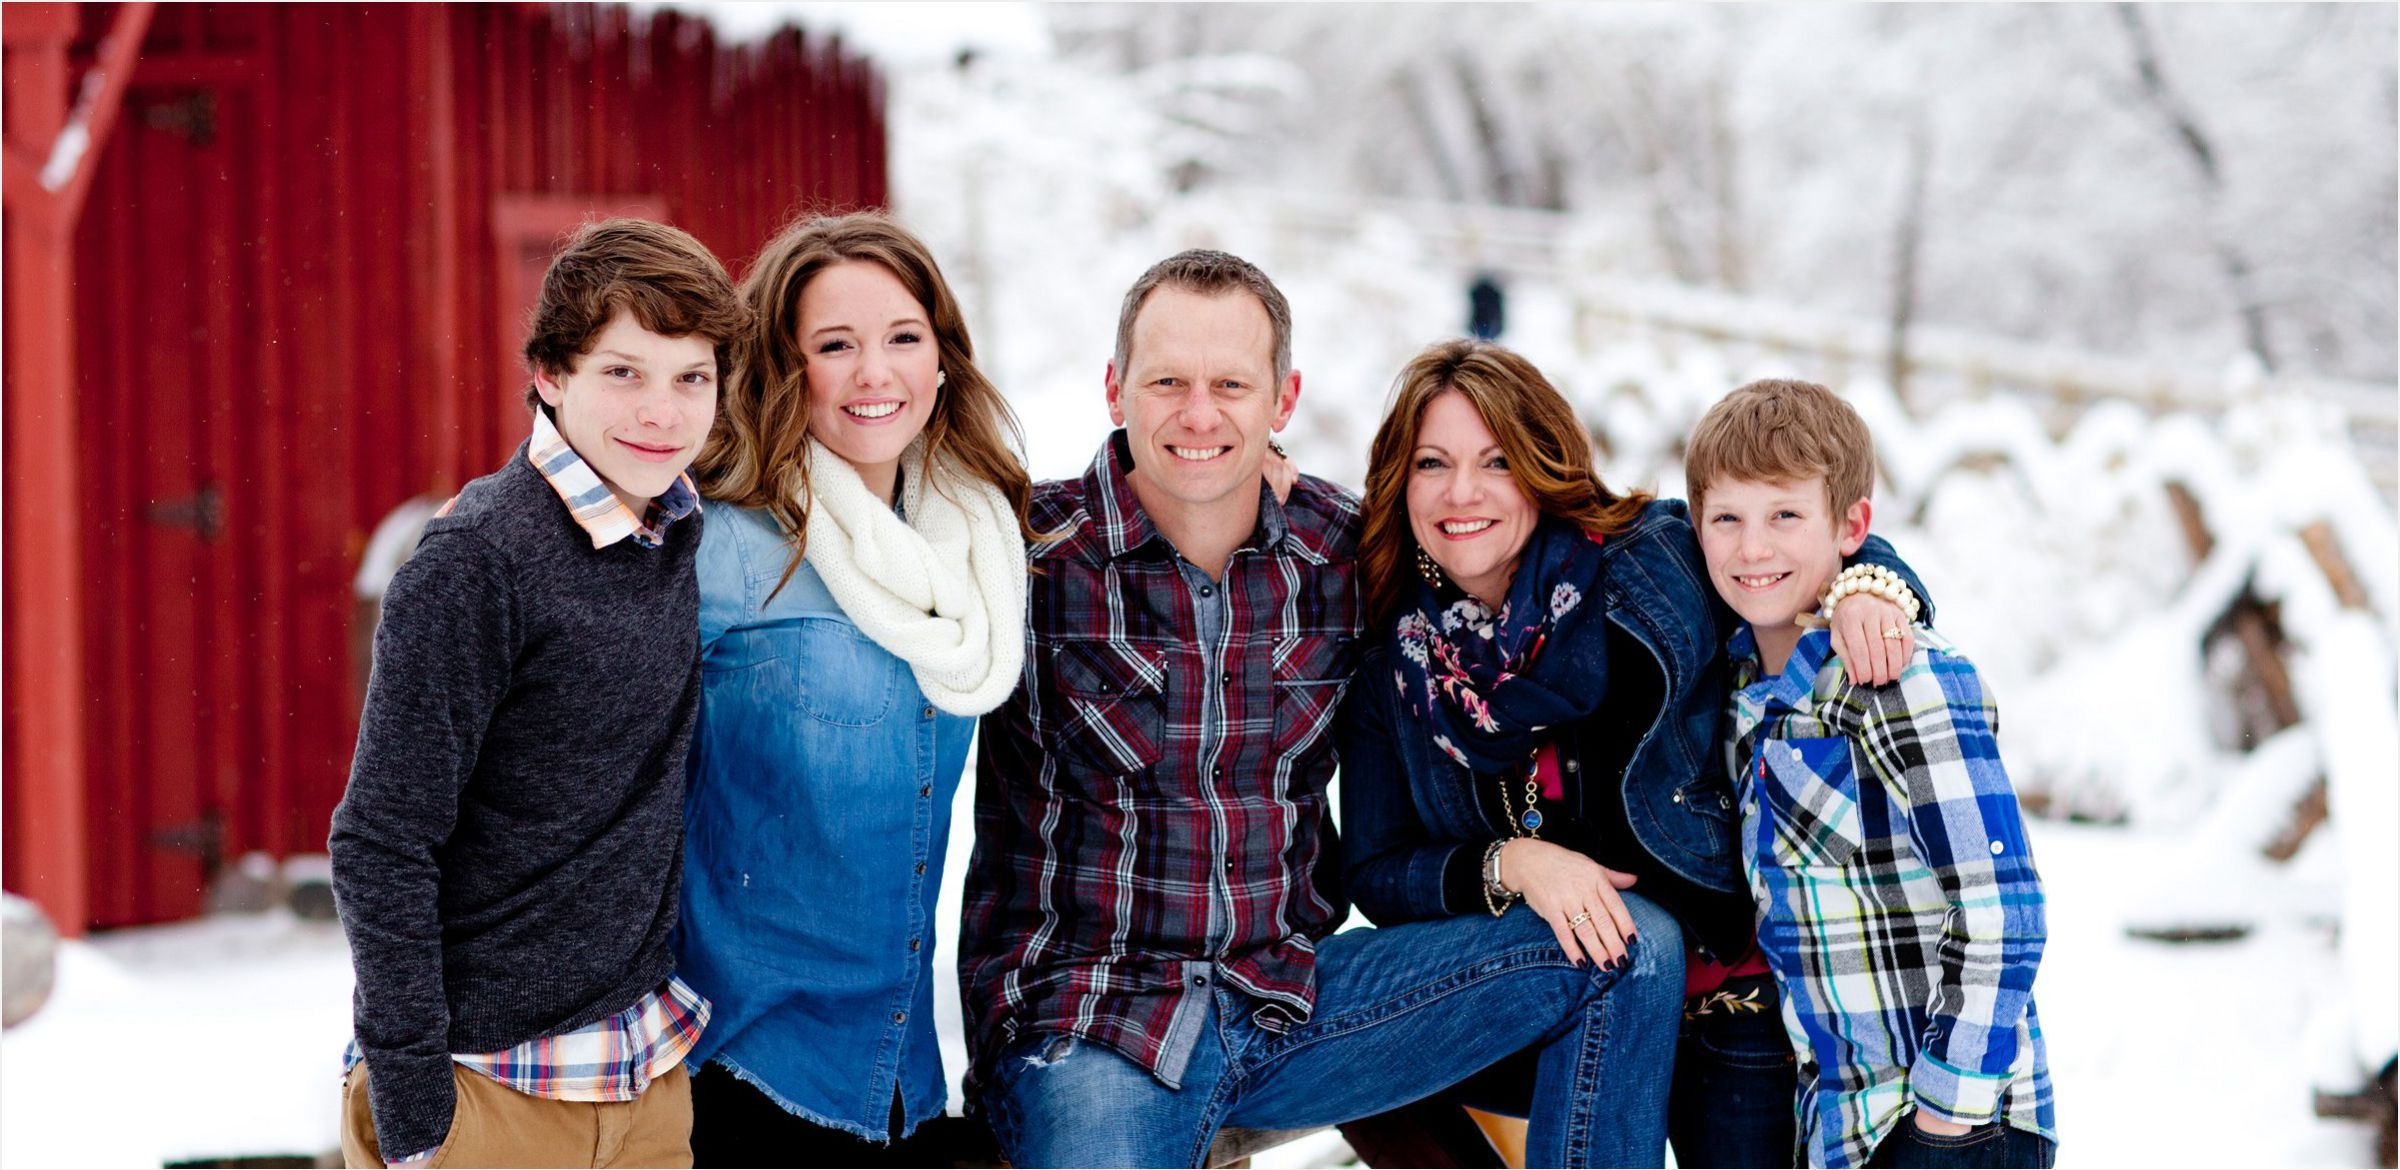 Snow-covered-family-portrait-session-colorado.jpg